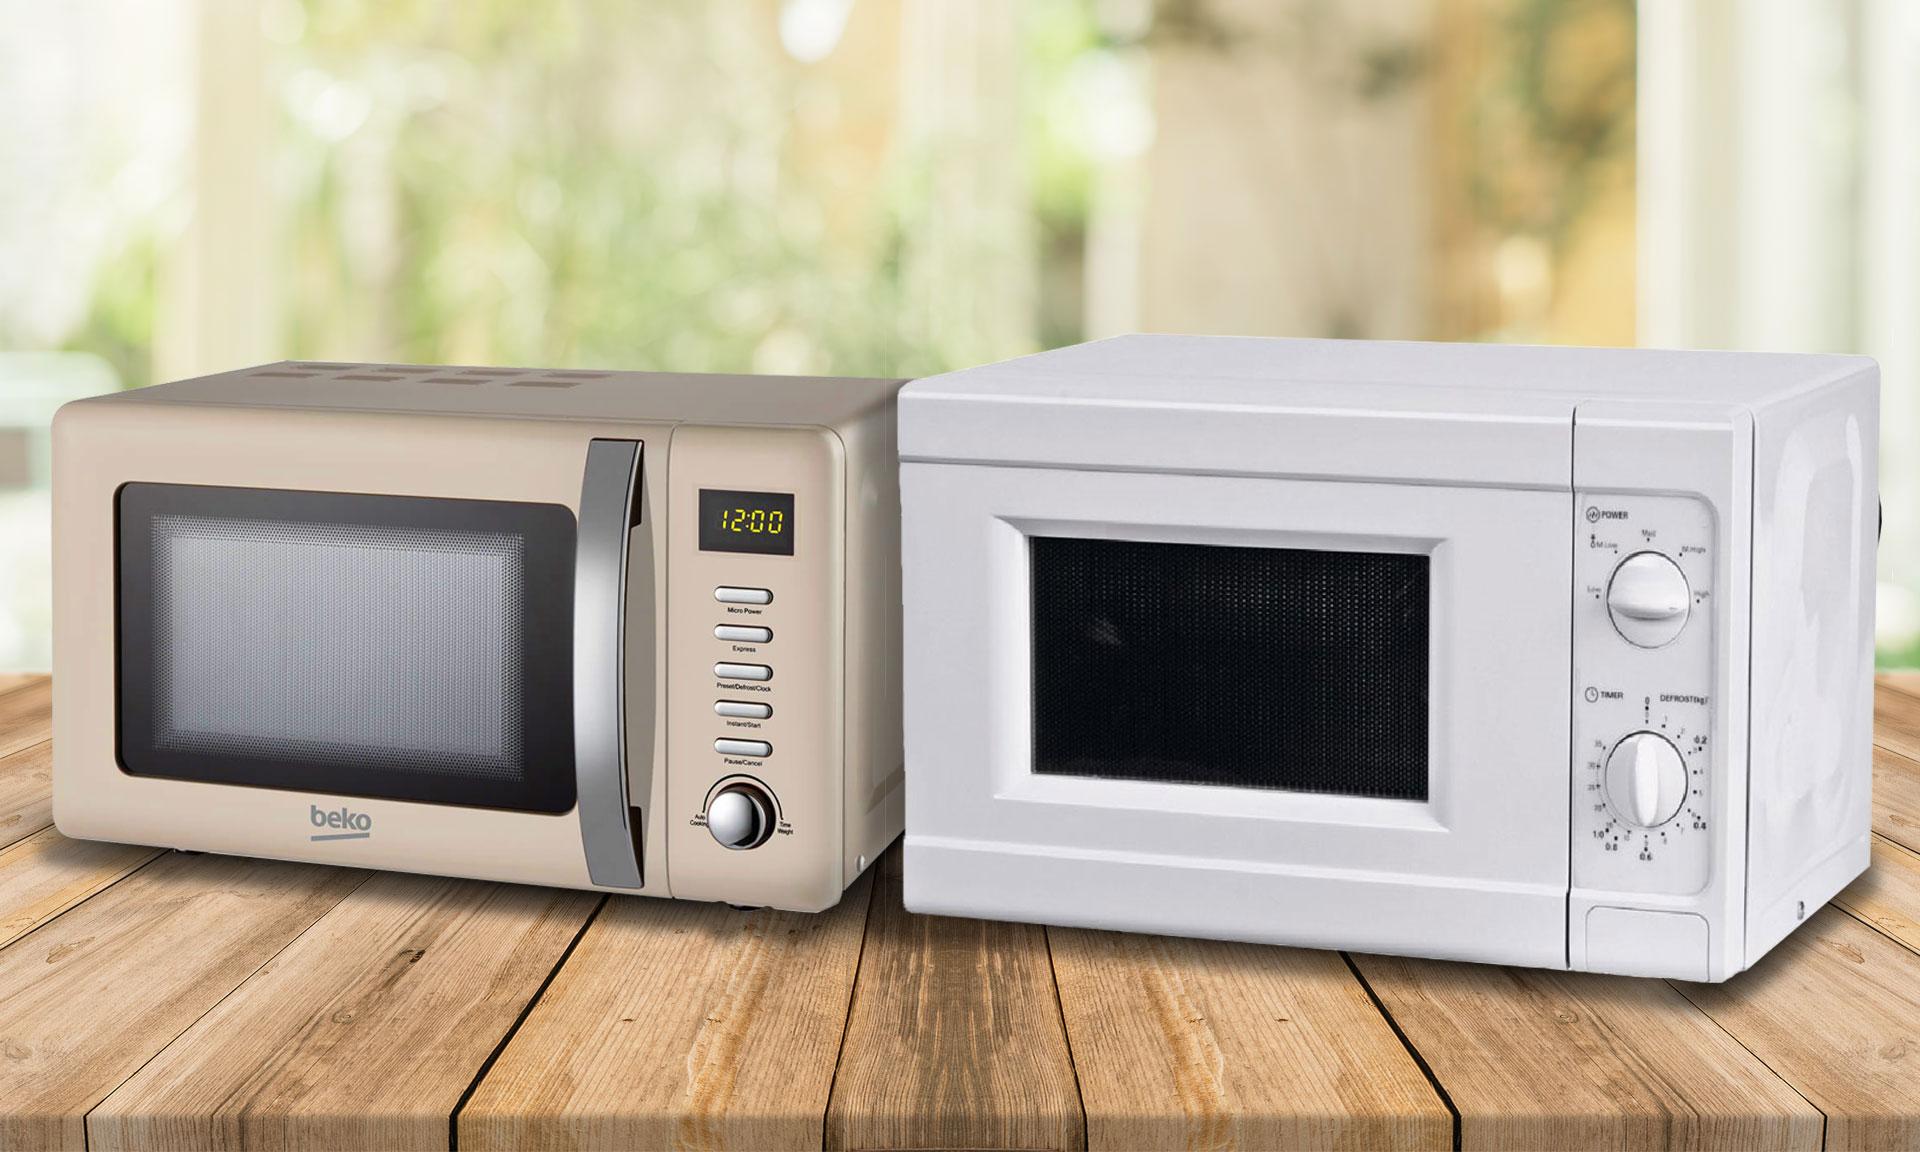 Argos Microwaves sale, Cheap Deals